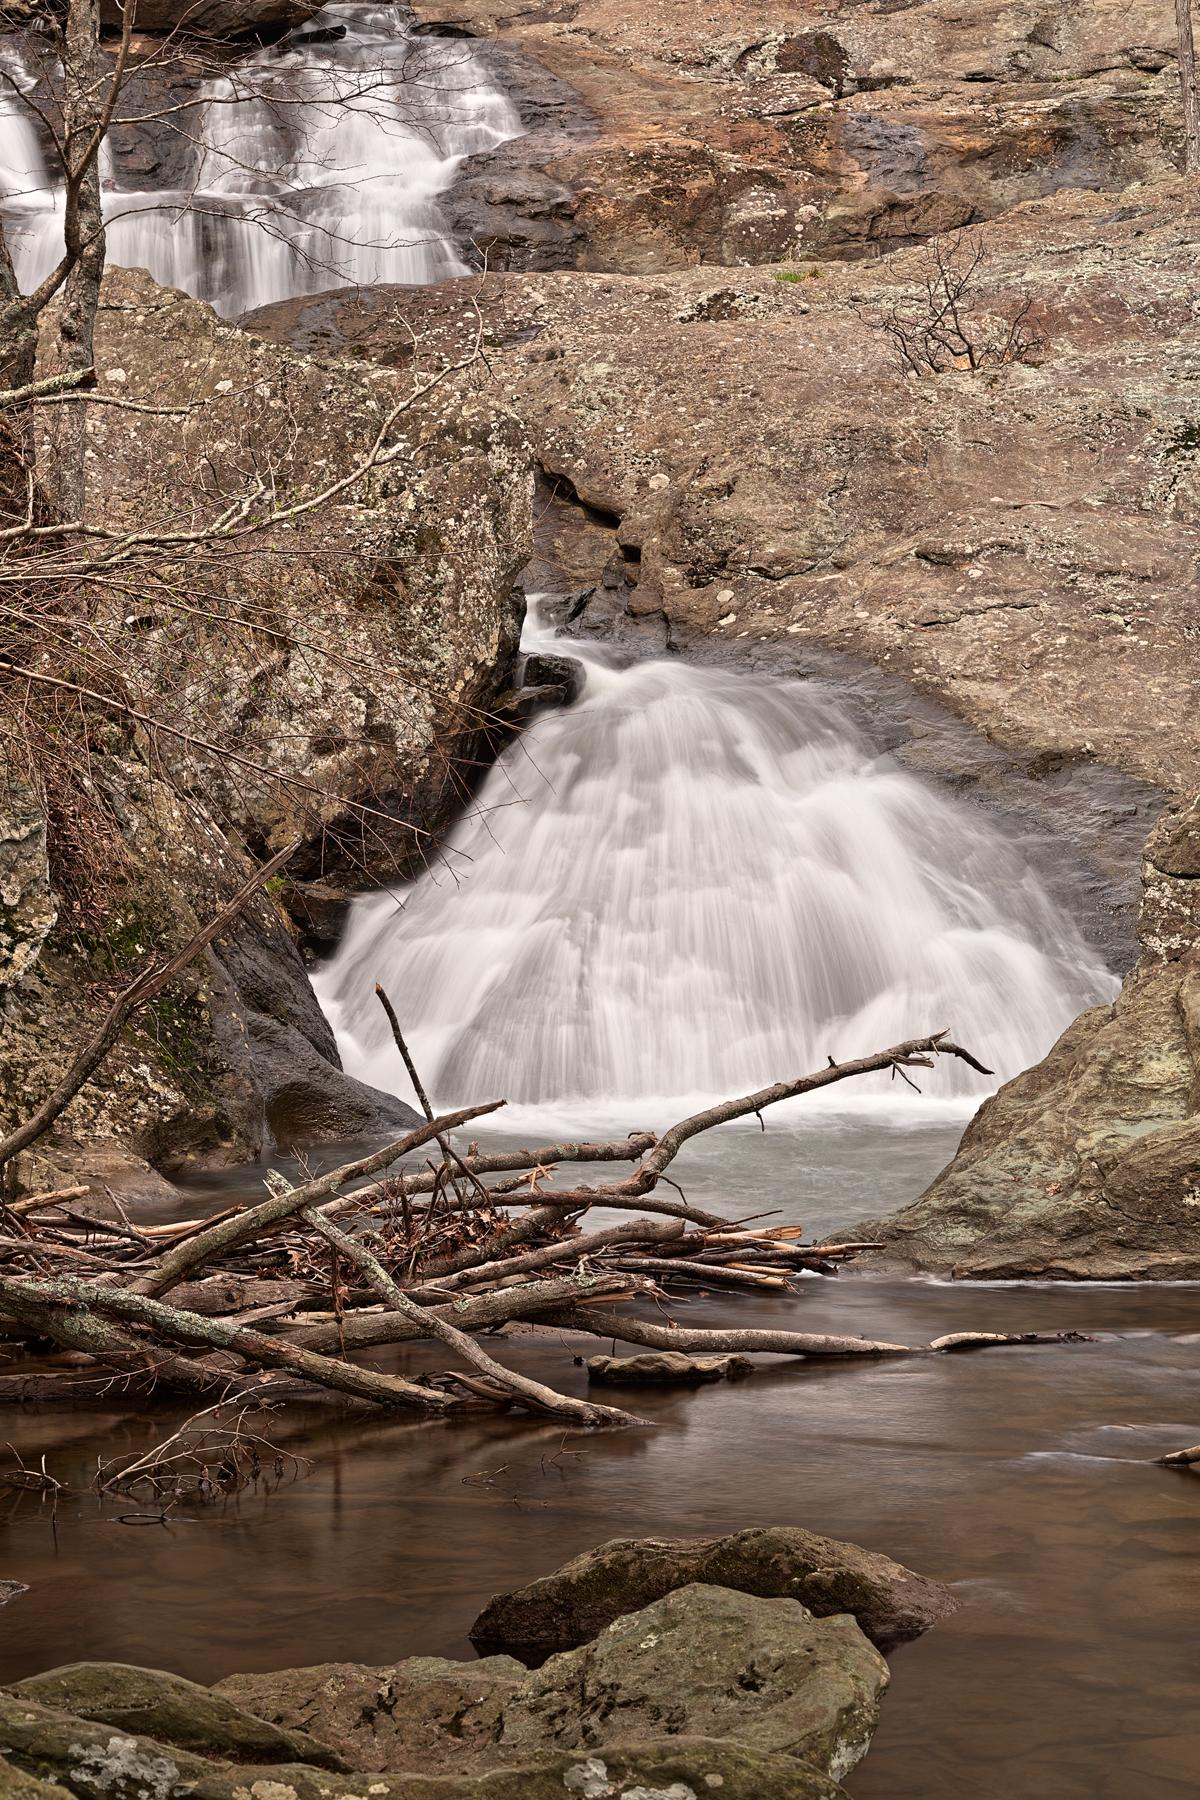 Cunningham falls - hdr photo